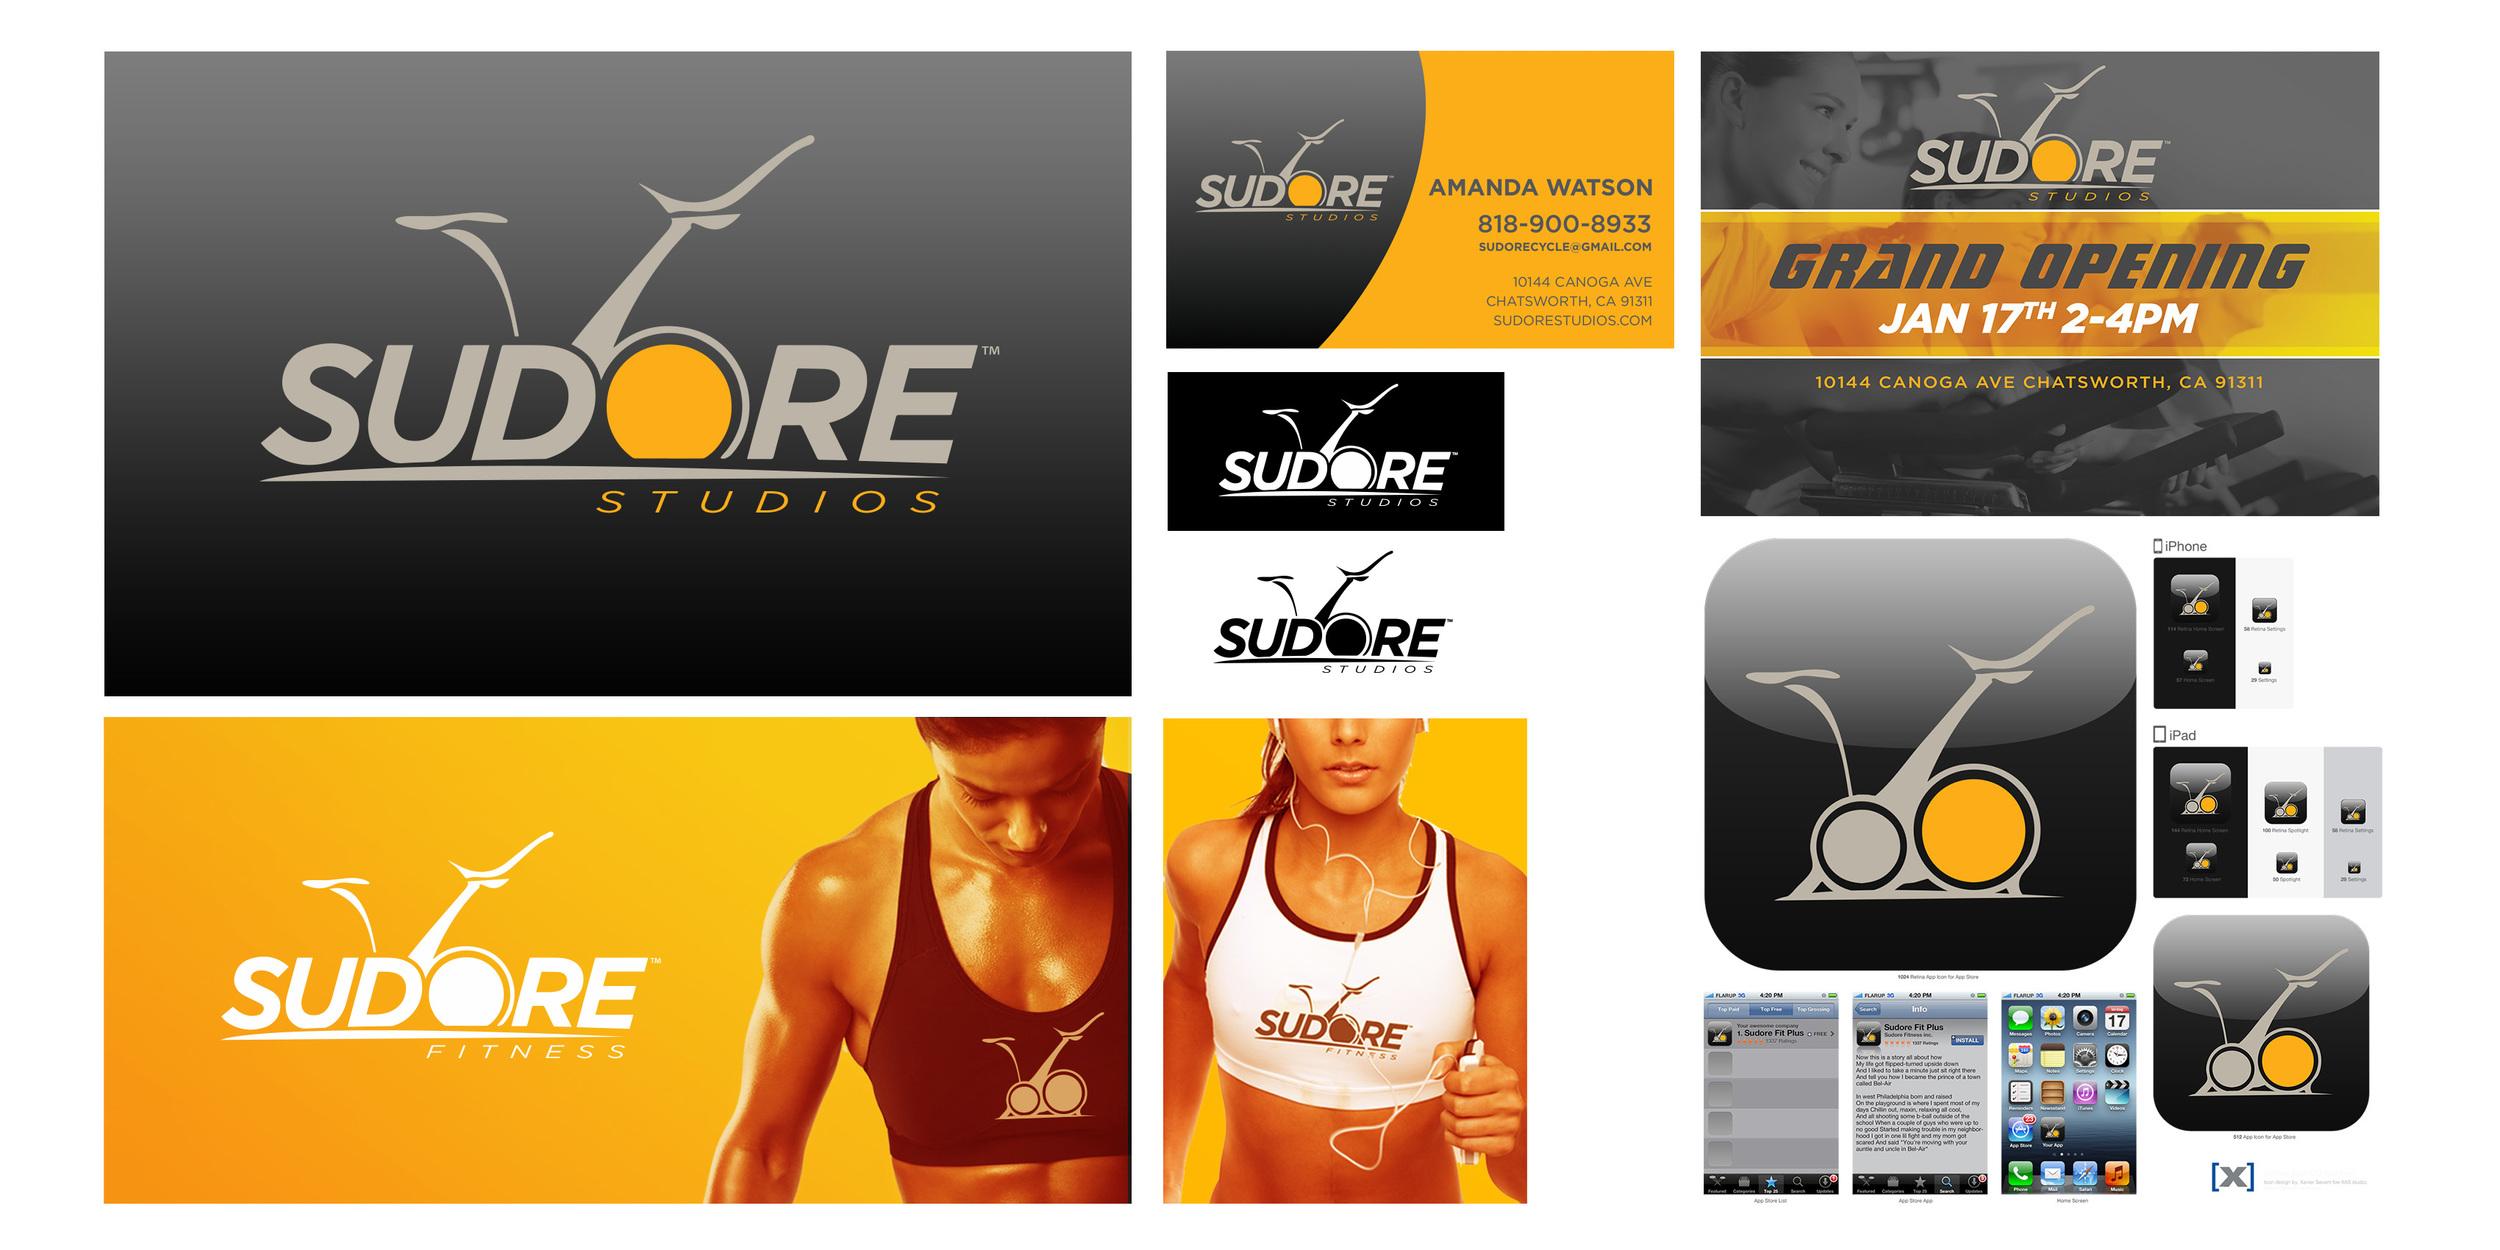 Sudore Studios Branding